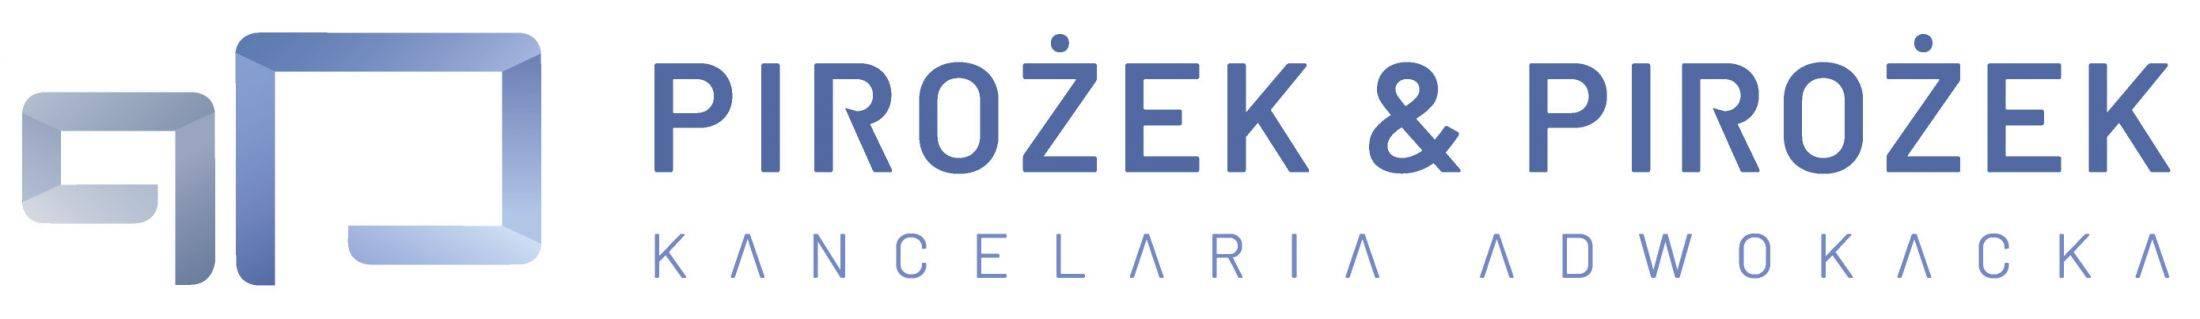 Adwokat Katowice - Pirożek & Pirożek - Kancelaria Adwokacka